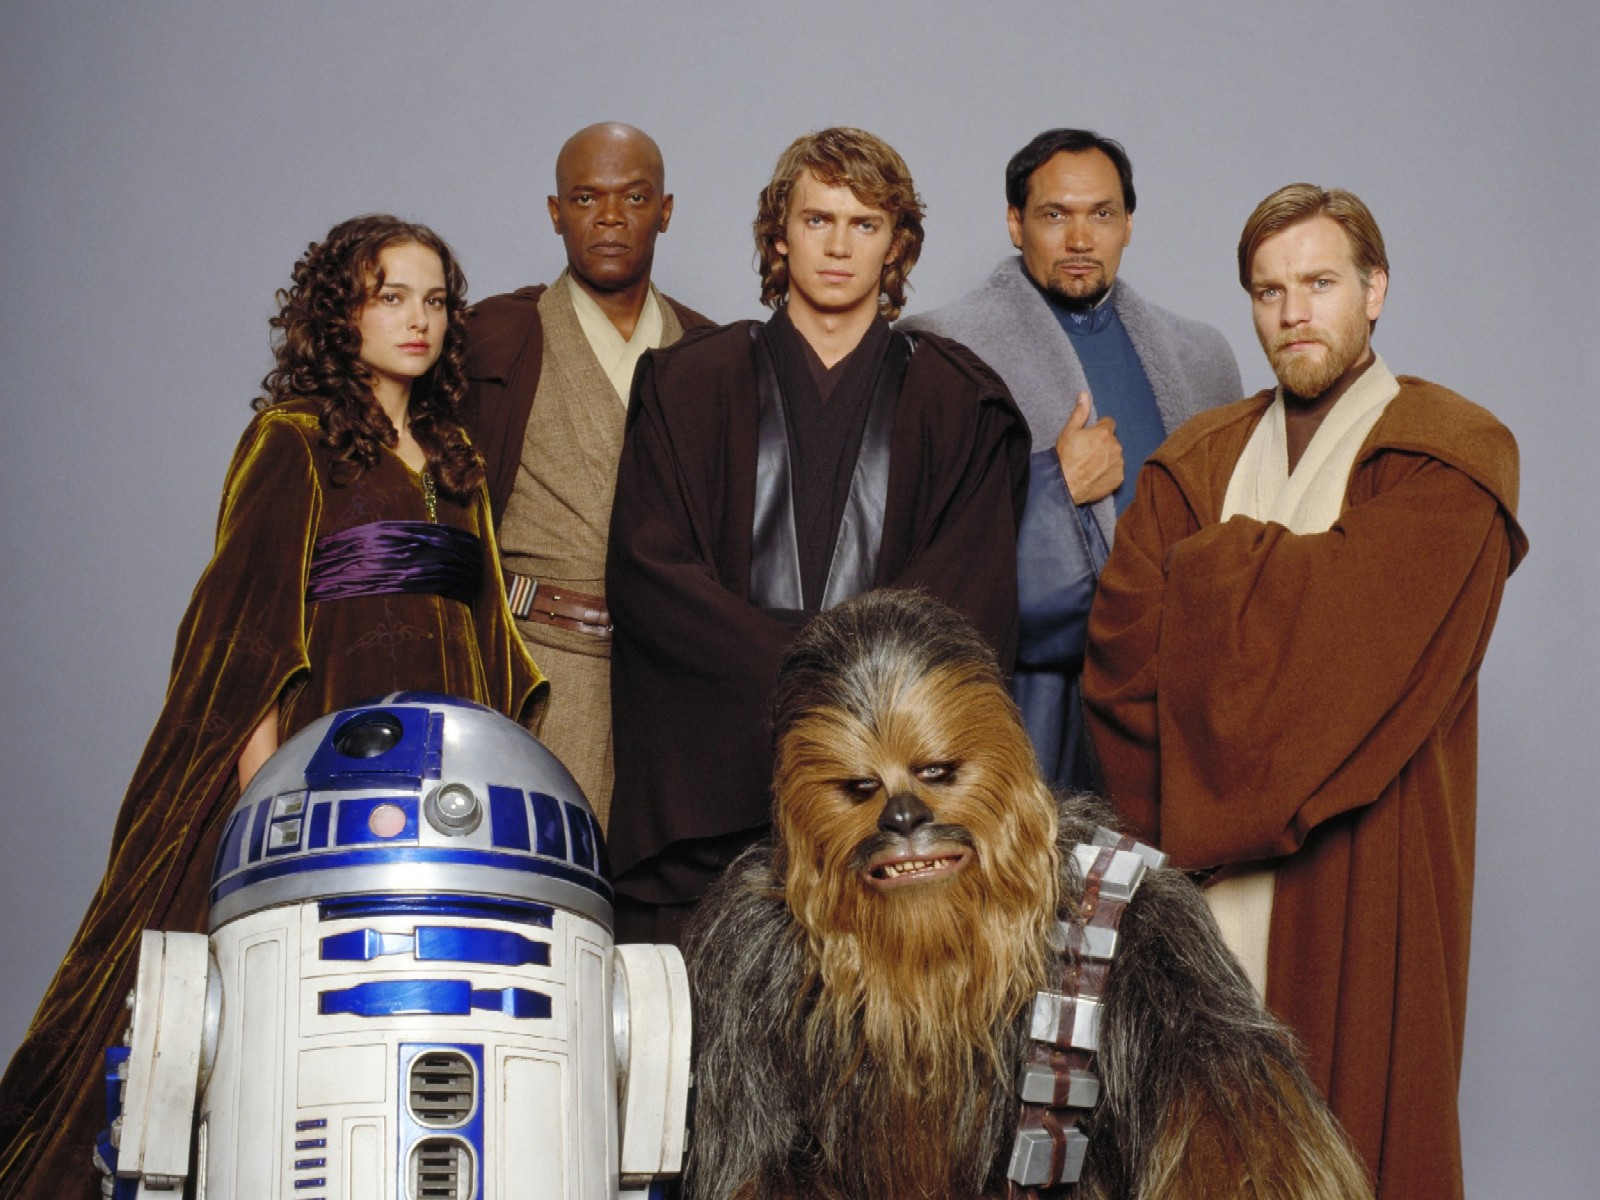 Sinopsis Star Wars Episode Iii Revenge Of The Sith Yang Akan Tayang Malam Ini Tribunstyle Com